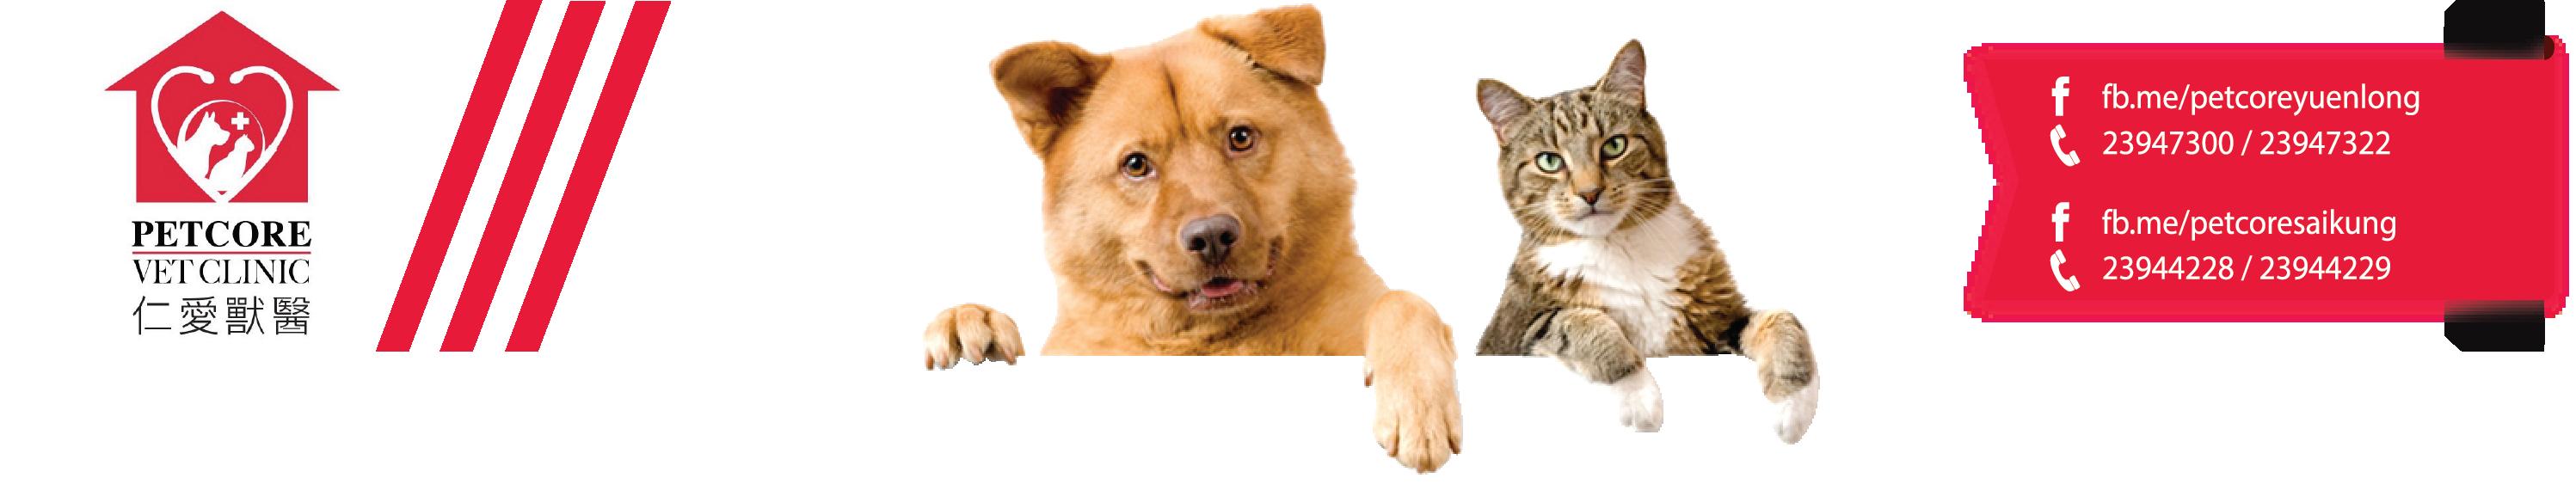 Petcore Veterinary Clinic 仁愛獸醫